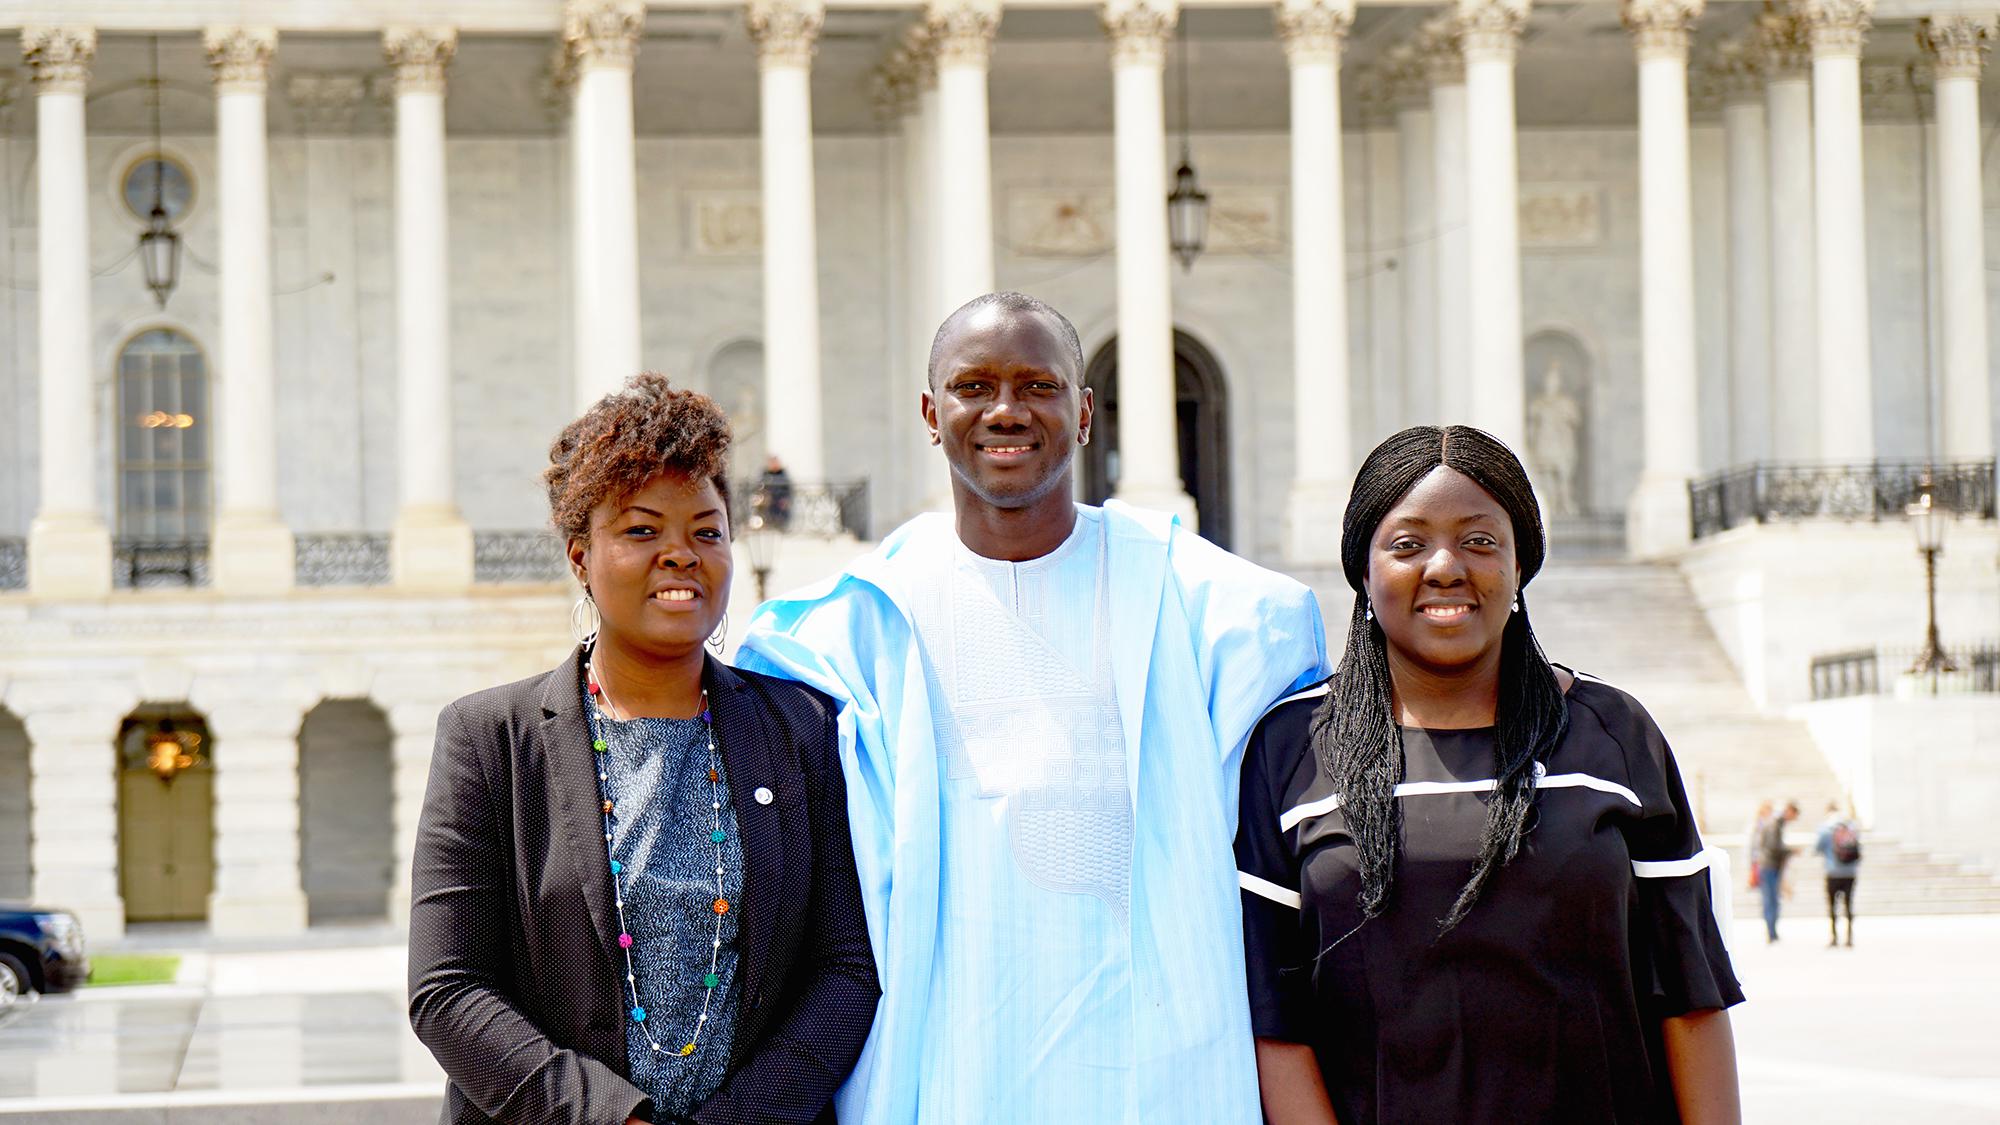 YALI Fellows Adjo Asare, Kémo Touré Jr., and Adepeju Jaiyeoba enjoyed a break during meetings on Capitol Hill.